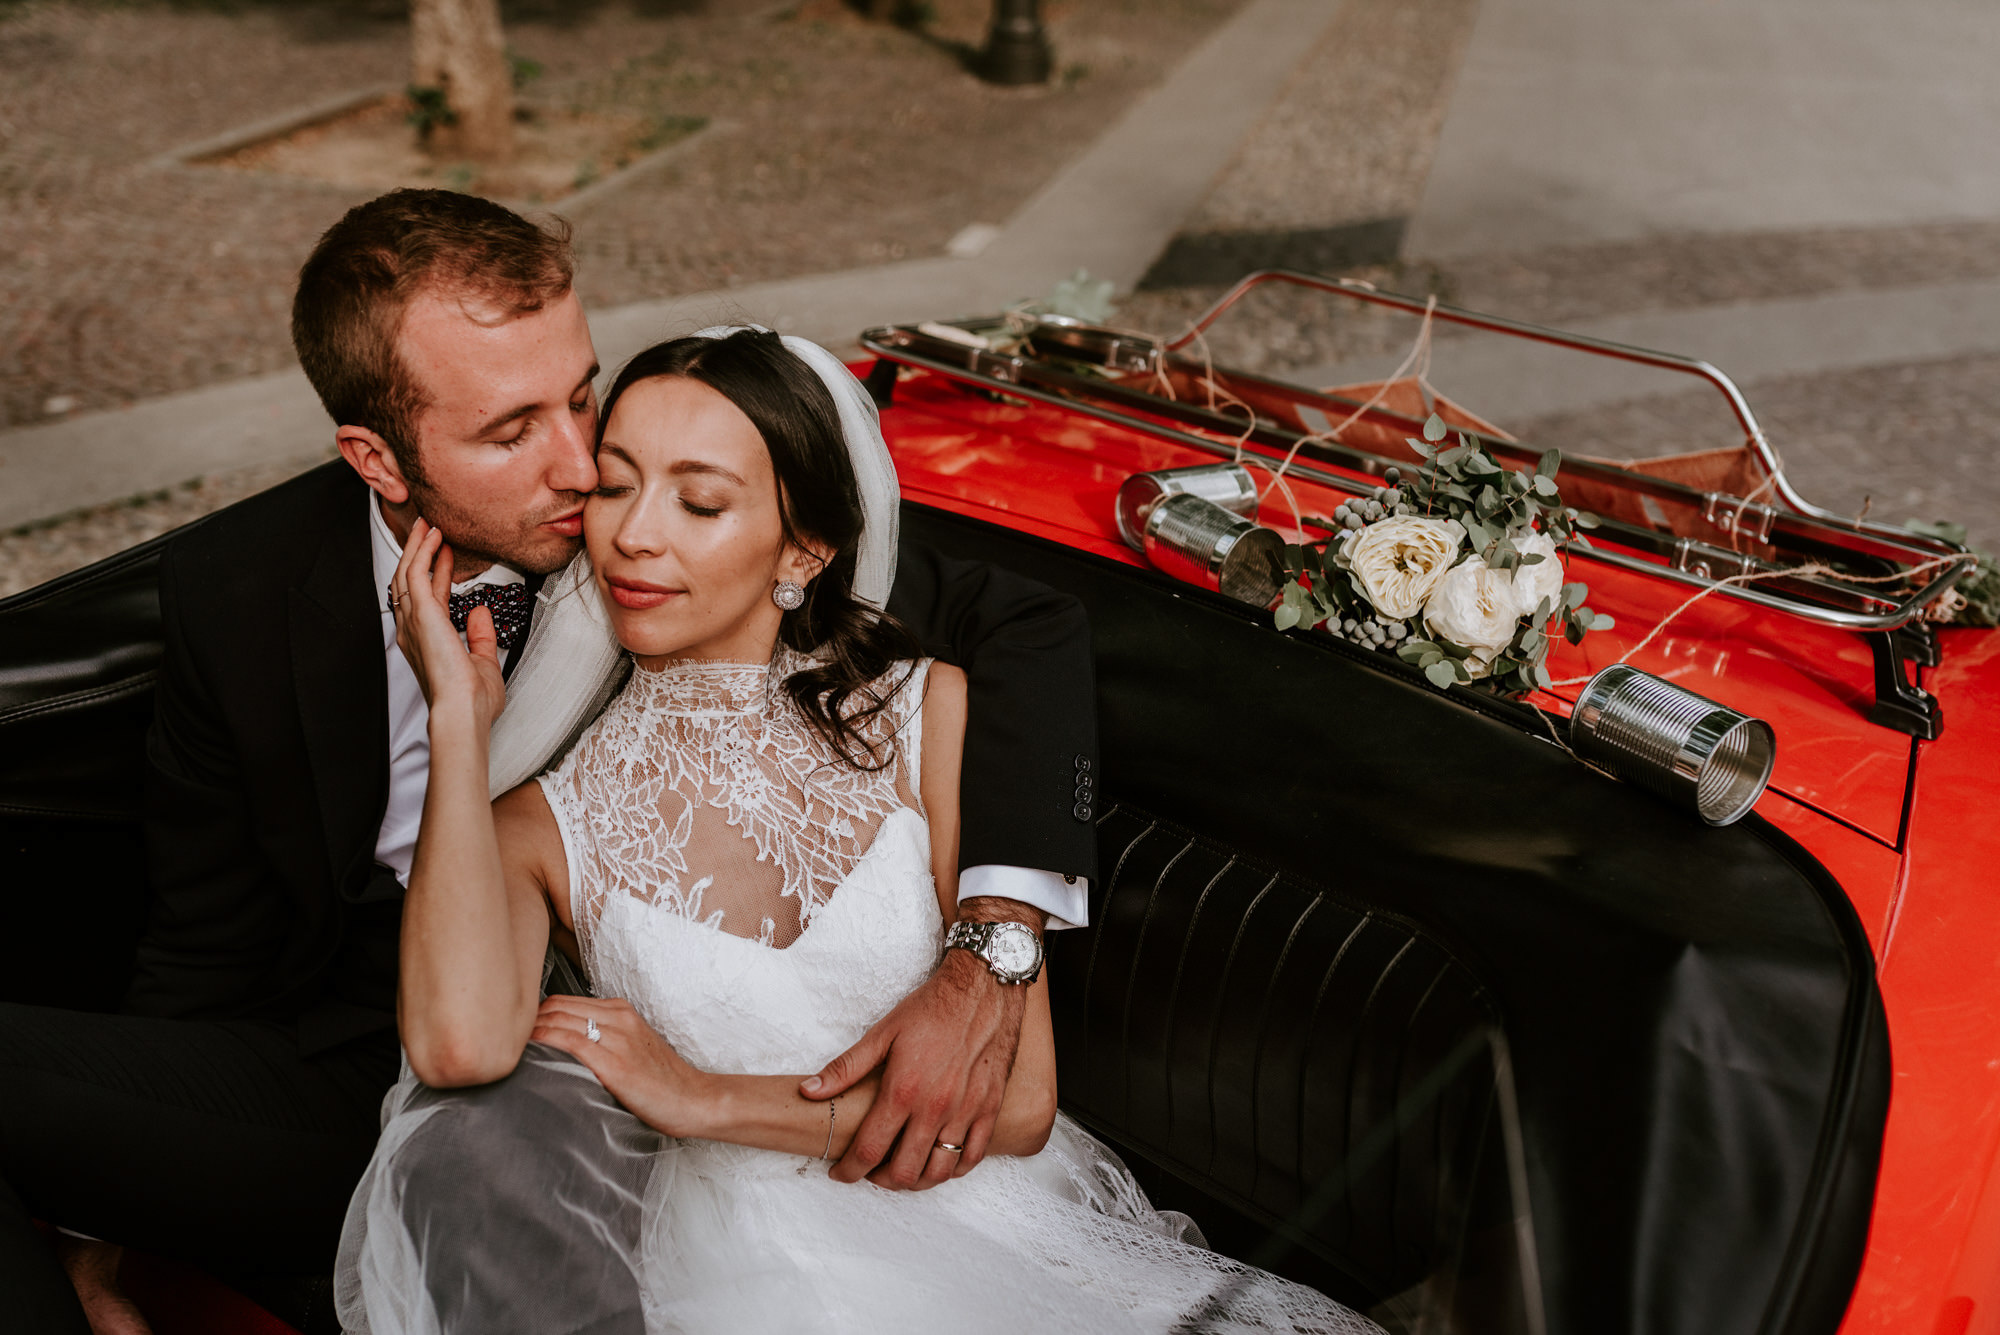 FOTO+PHOTO+BODA+WEDDING+ITALIA+ITALY+MAURICIO+GARAY+MAURICIOGARAY+WEDDINPHOTOGRAPHER+FOTOGRAFODEBODA-1337.jpg